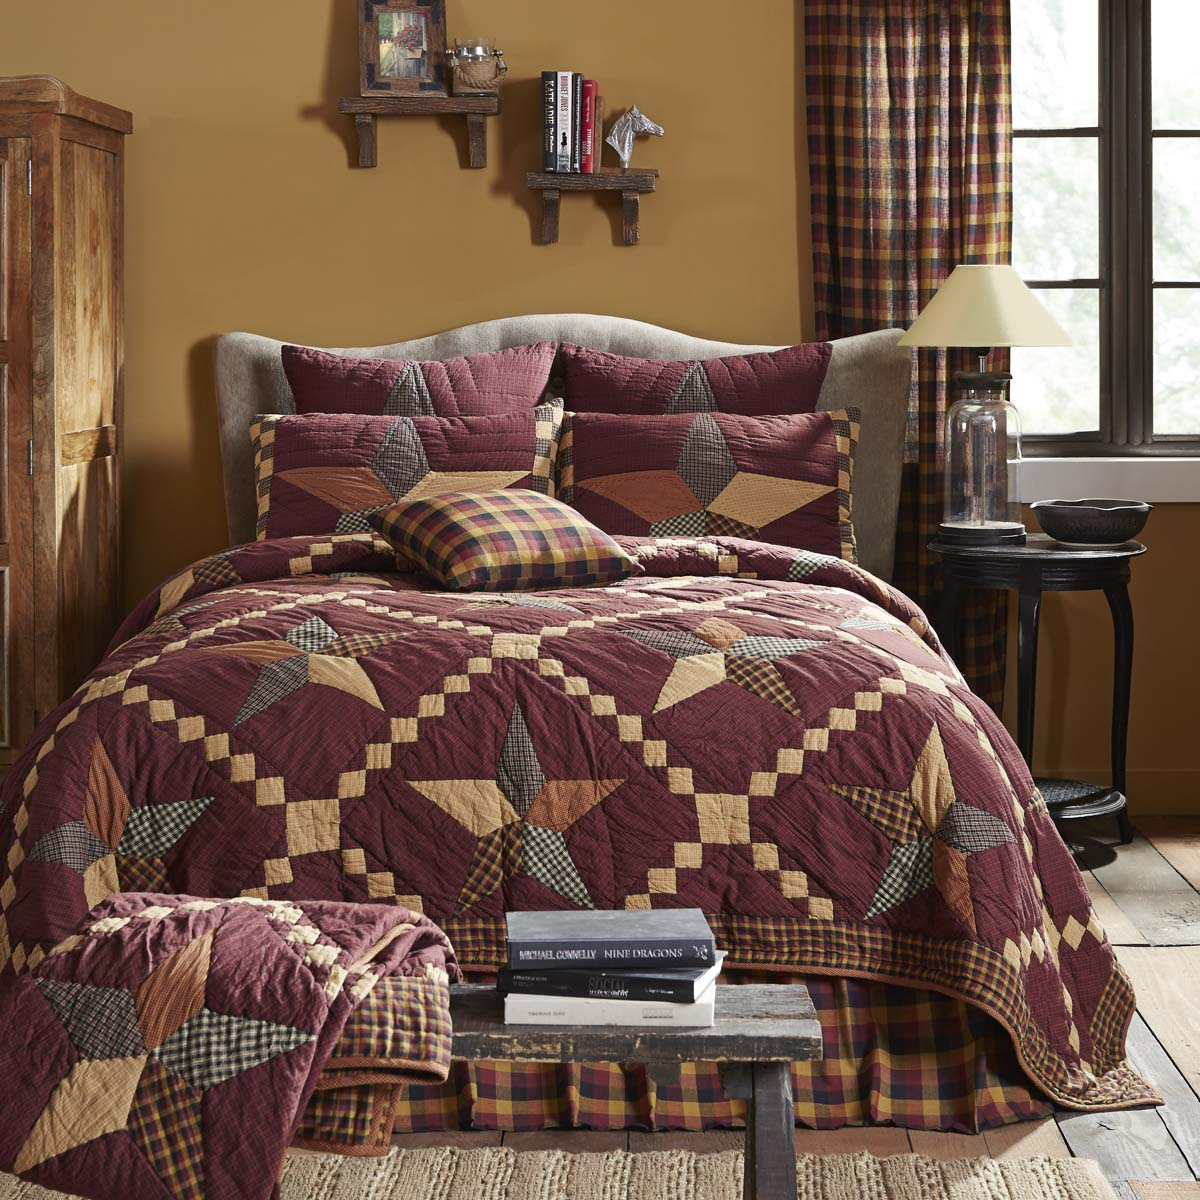 Folkways Star King Quilt 105Wx95L